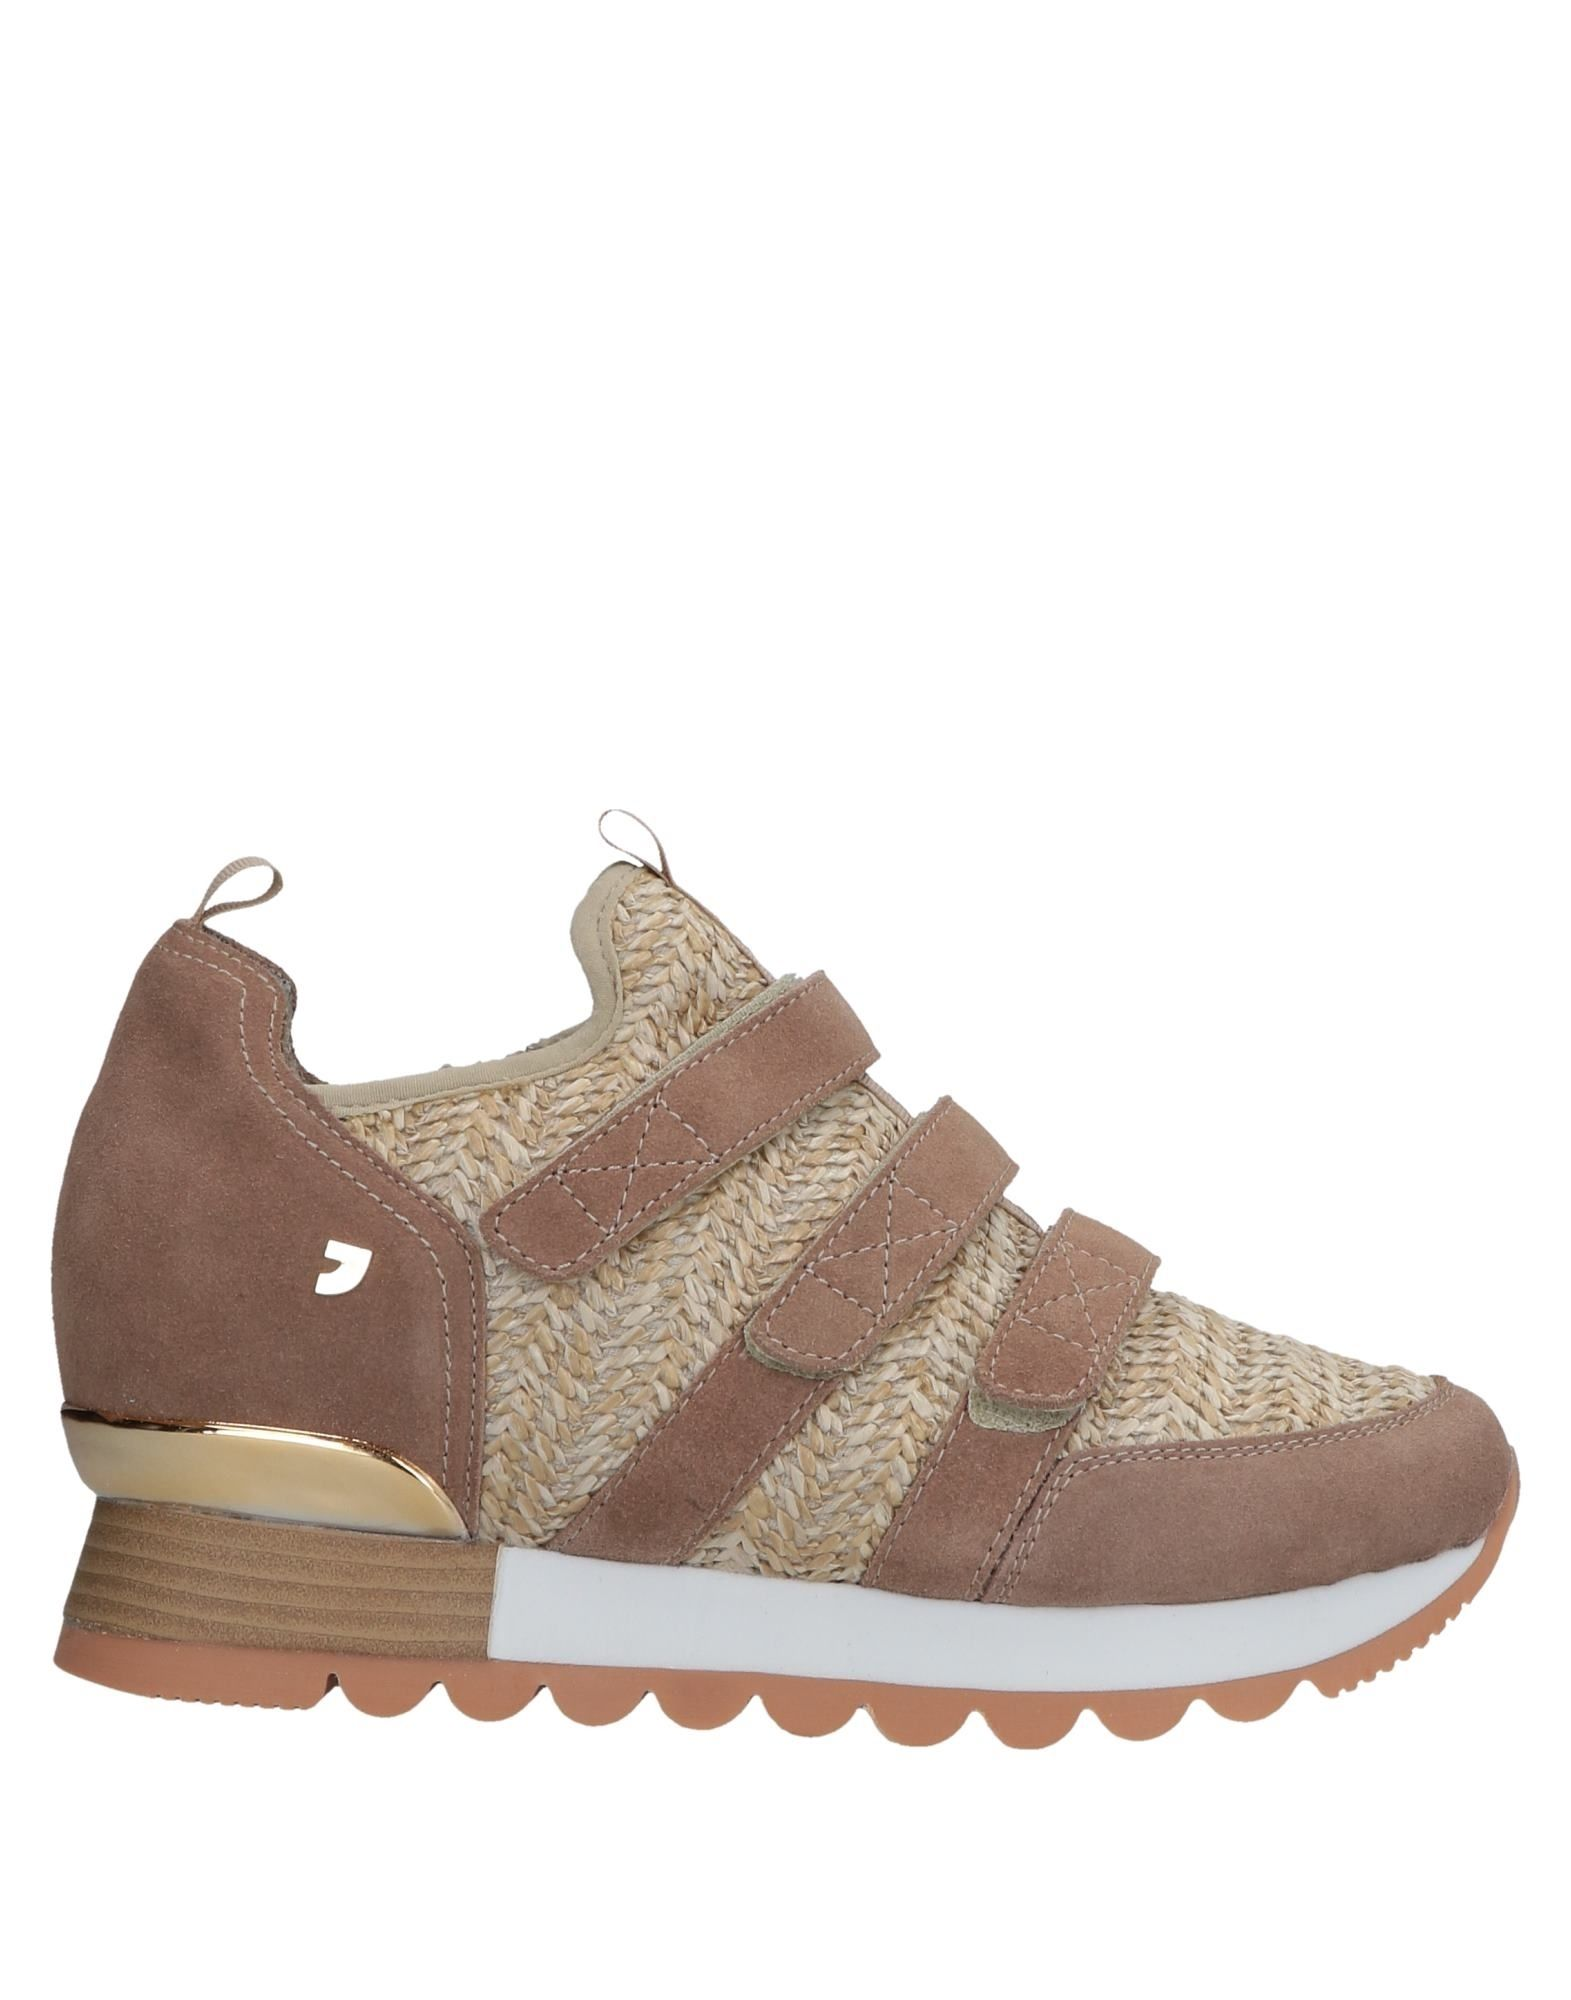 Gioseppo 11575596TI Turnschuhes Damen 11575596TI Gioseppo Gute Qualität beliebte Schuhe 2282bd